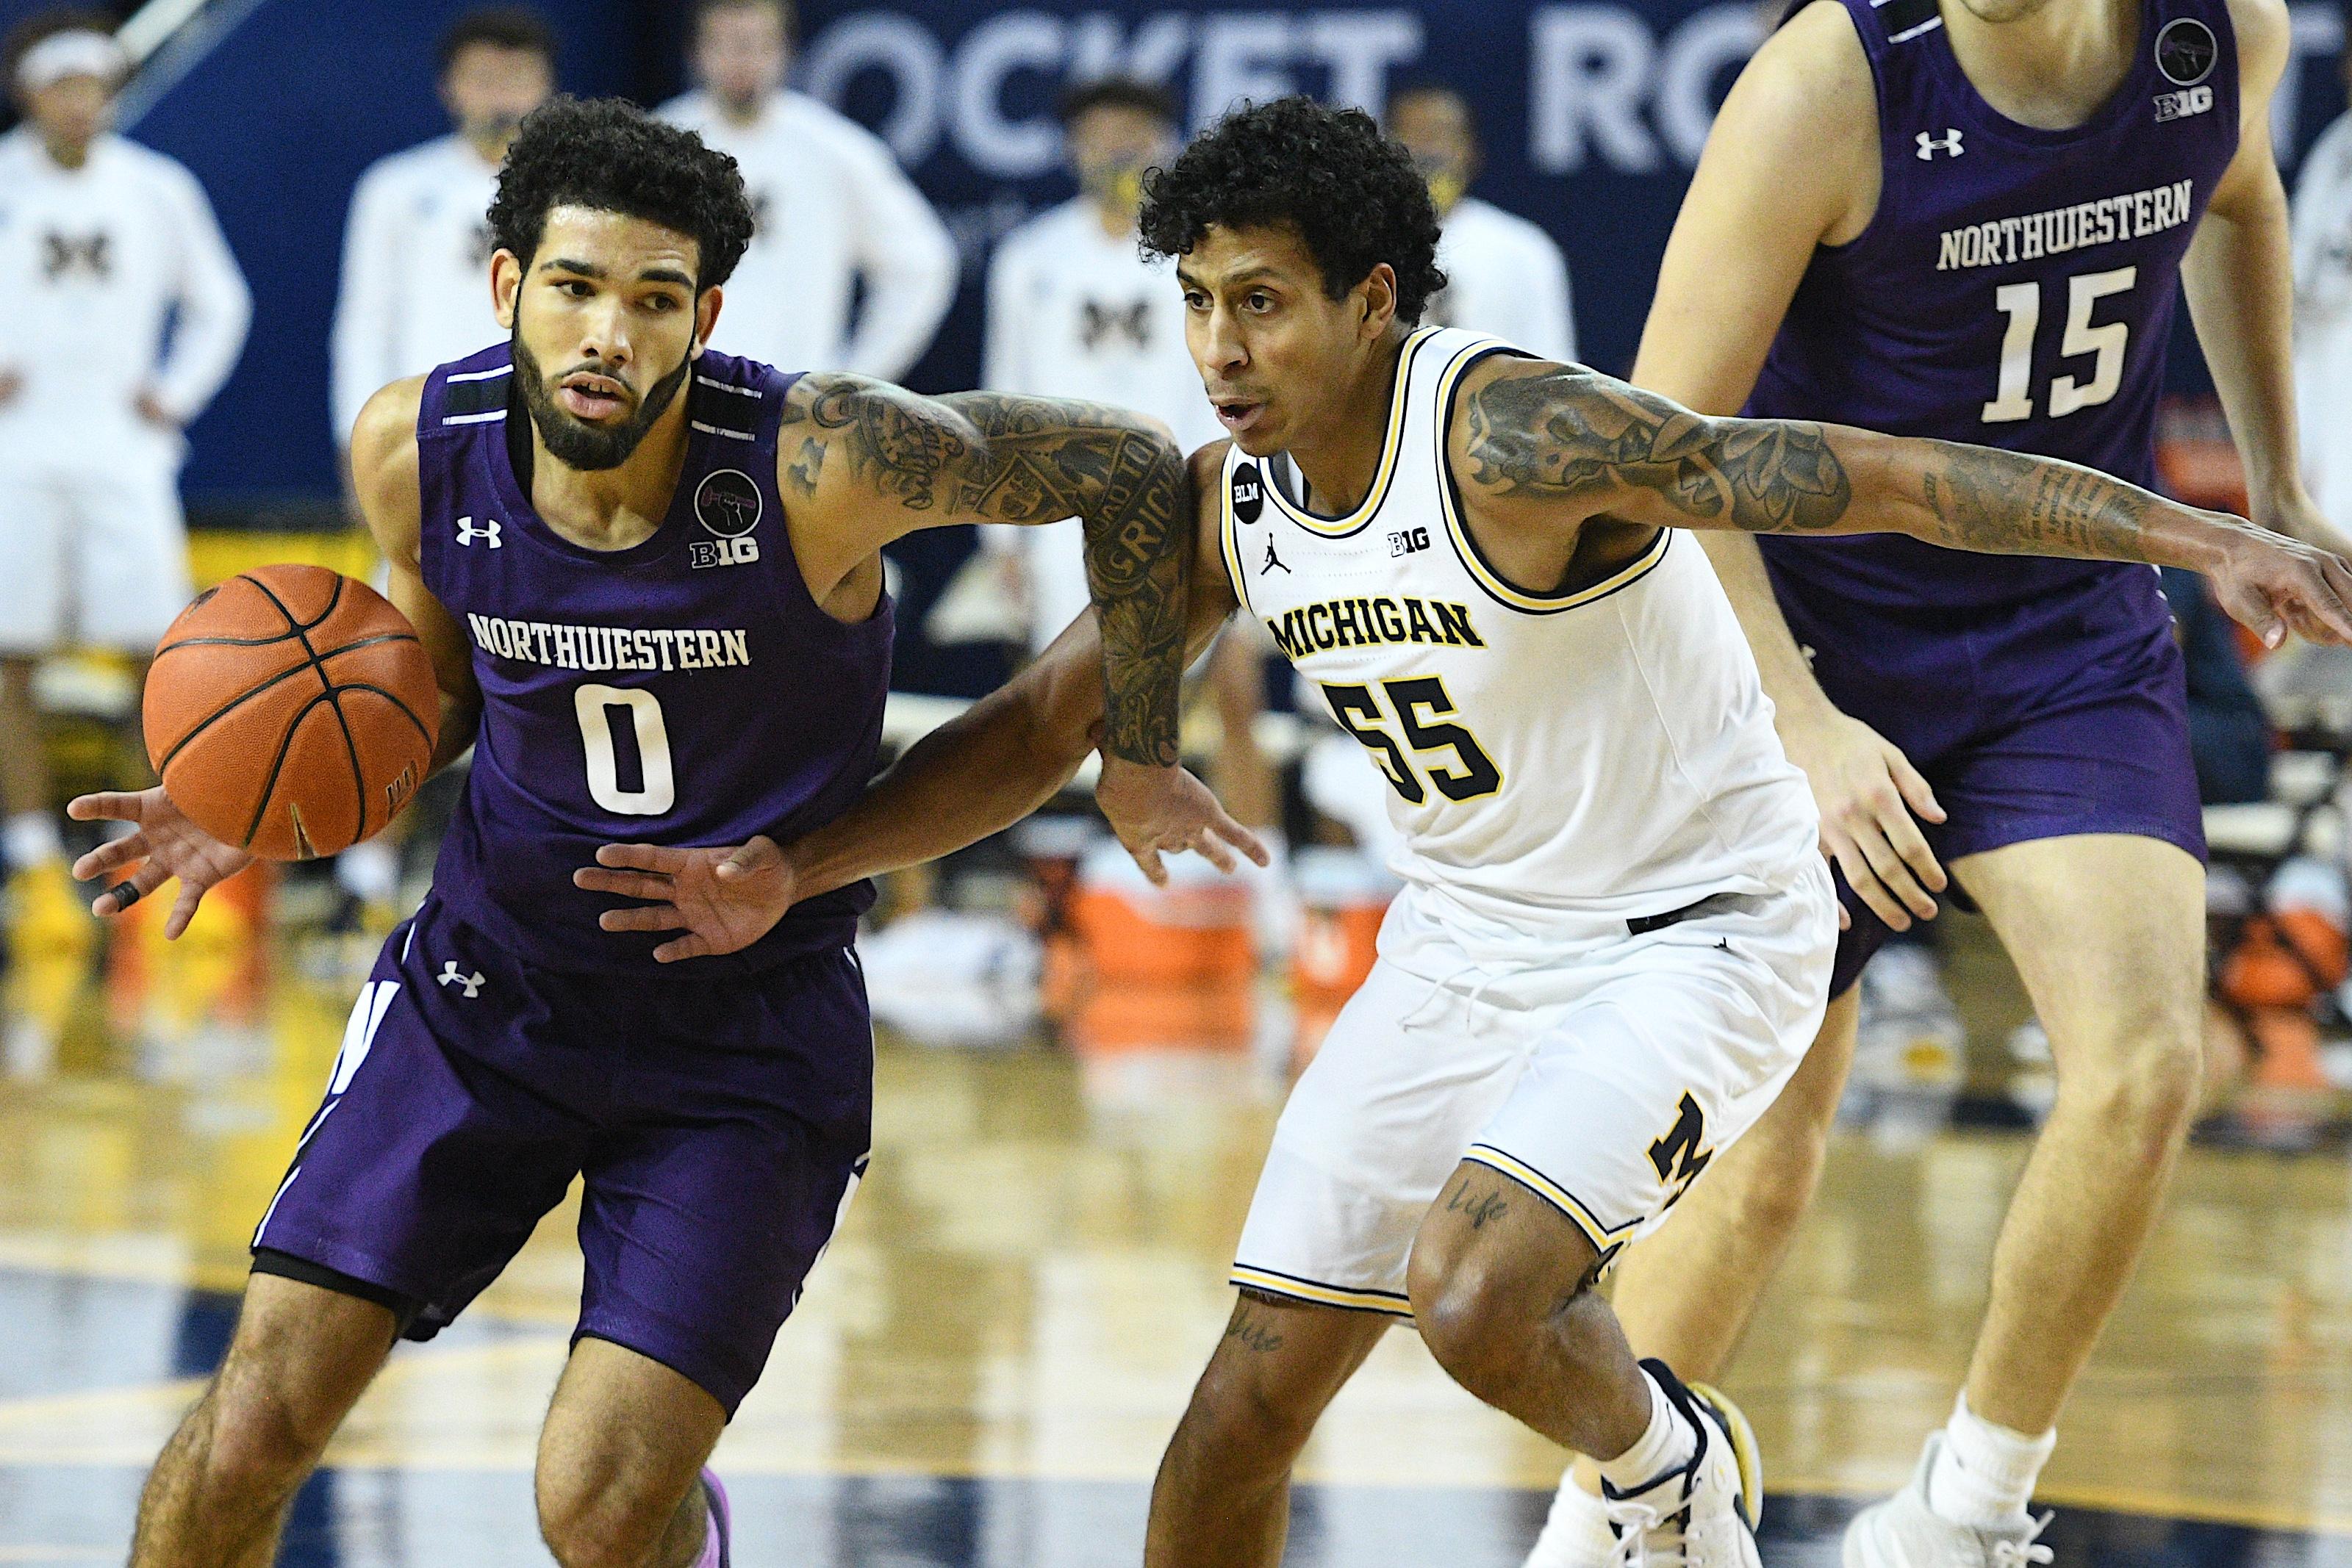 NCAA Basketball: Northwestern at Michigan